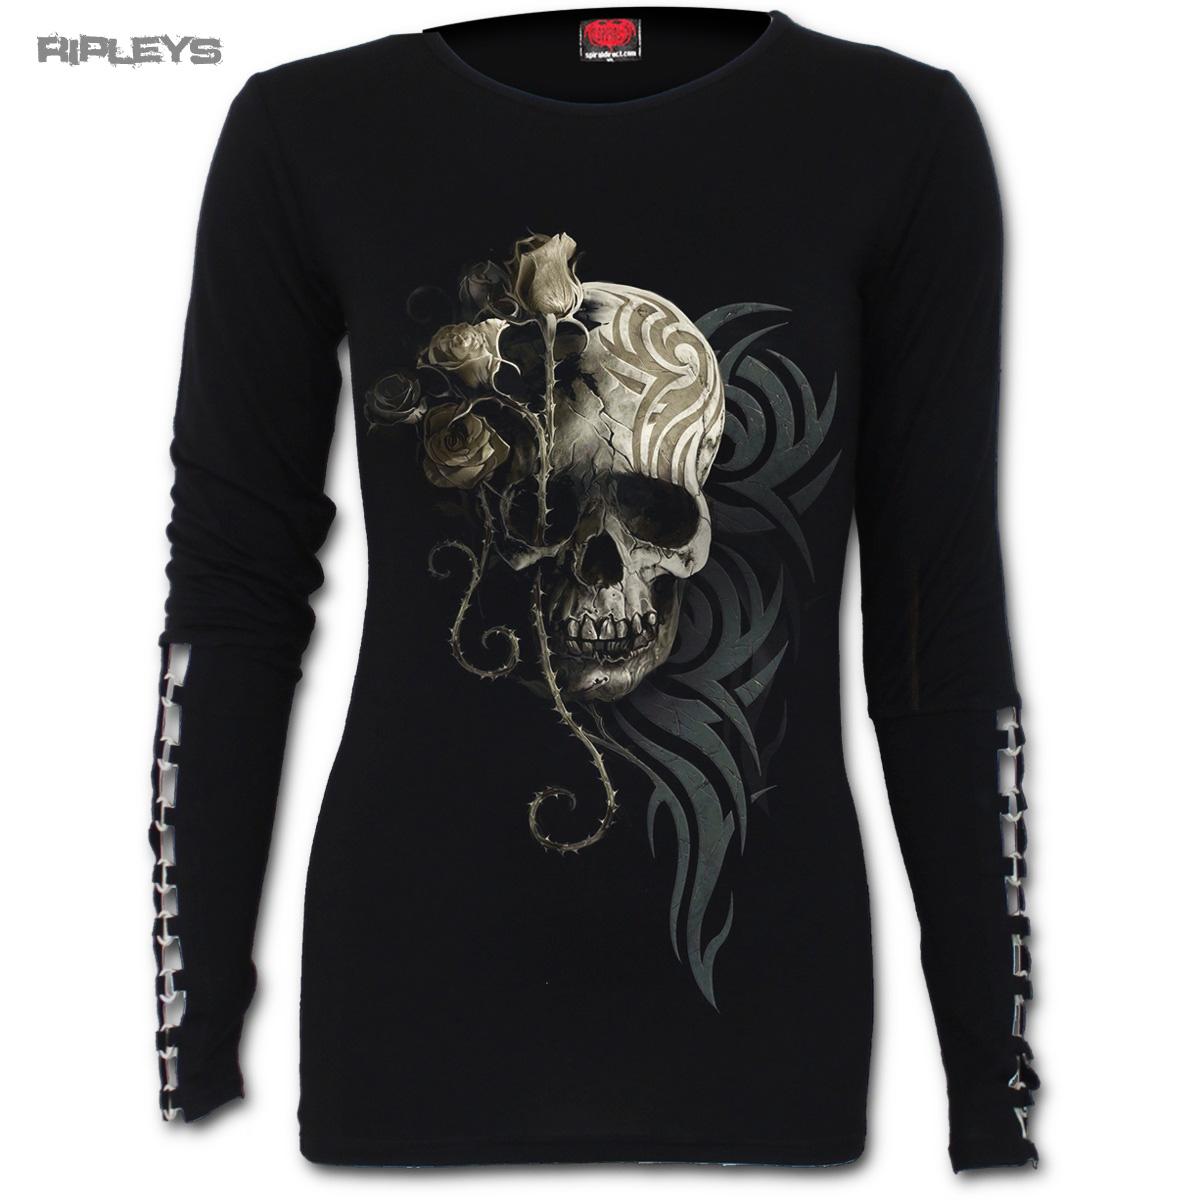 SPIRAL-DIRECT-Ladies-Black-Goth-DARK-ANGEL-Skull-Buckle-L-Sleeve-All-Sizes thumbnail 2